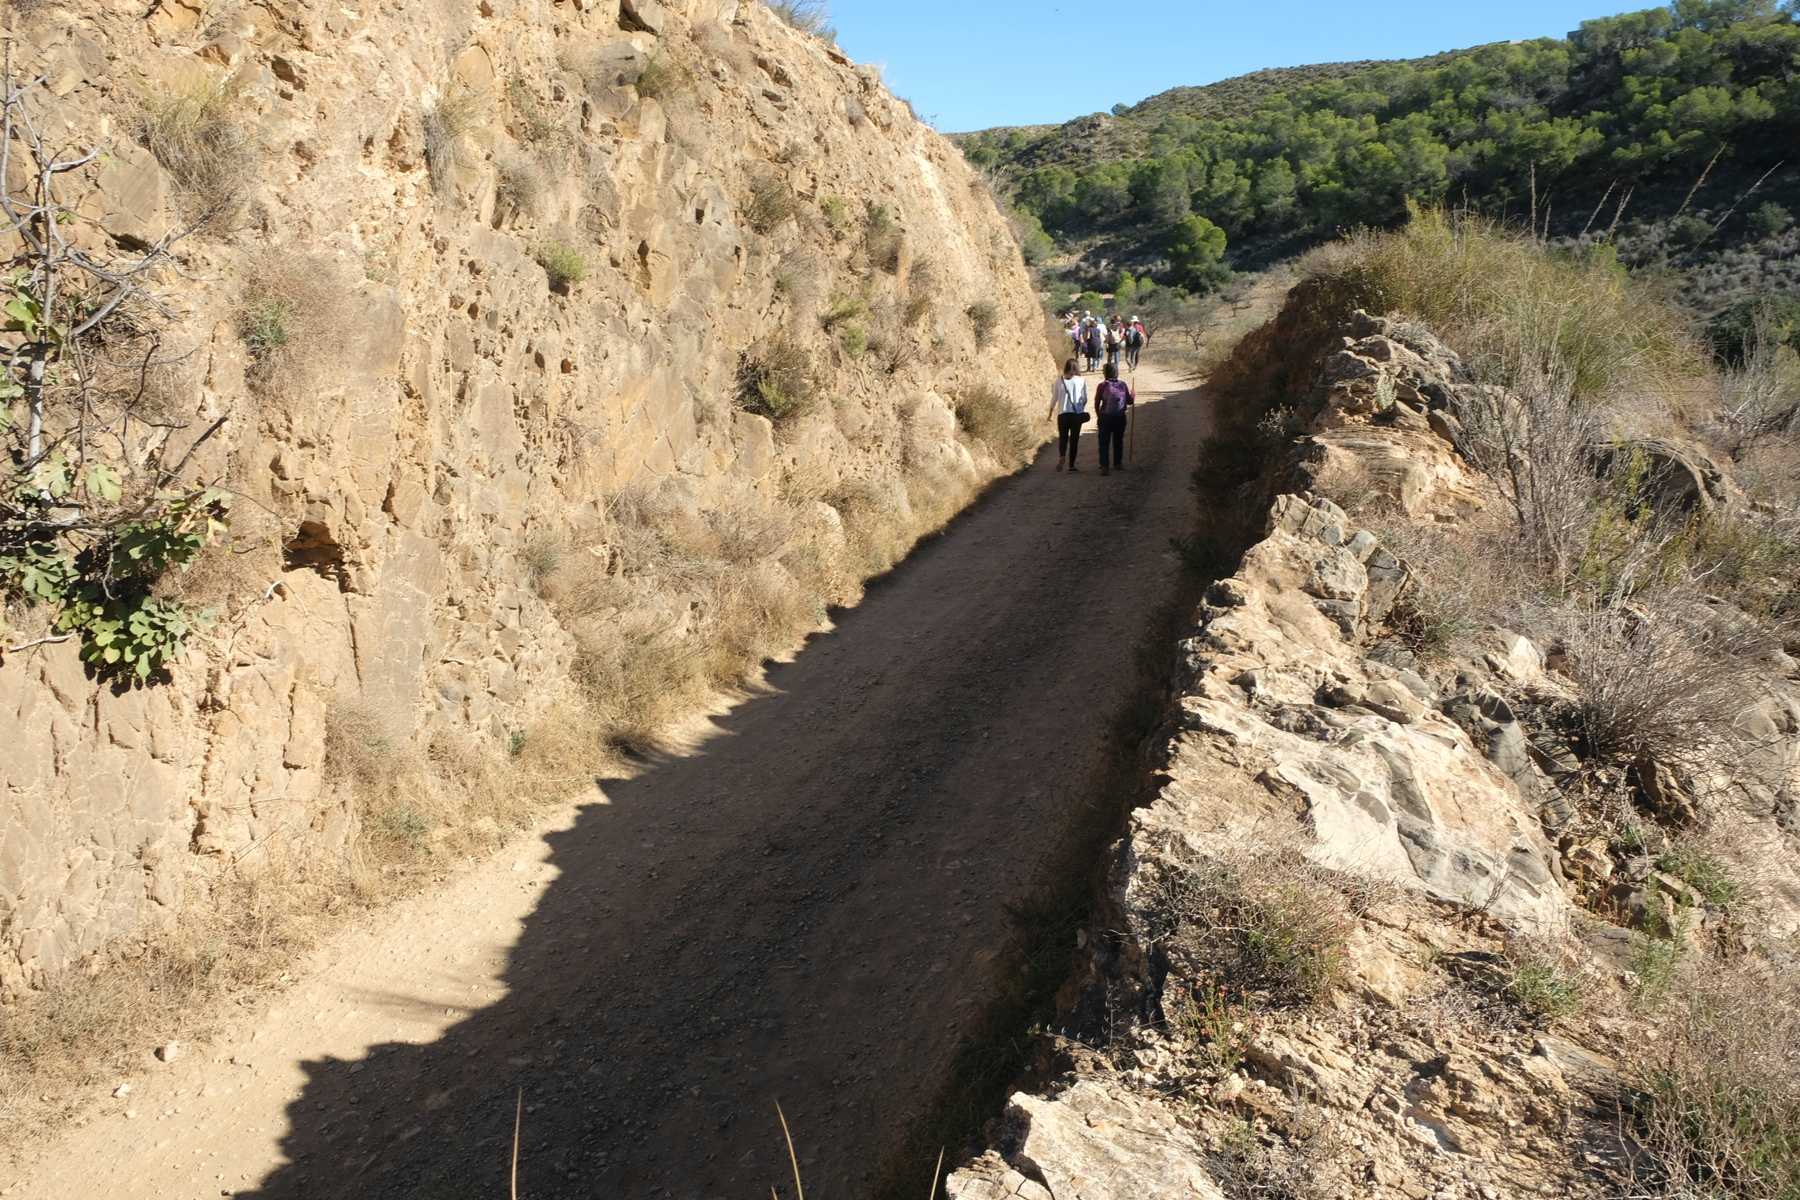 Antigua trinchera del ferrocarril minas de Bédar © Paco Bonilla